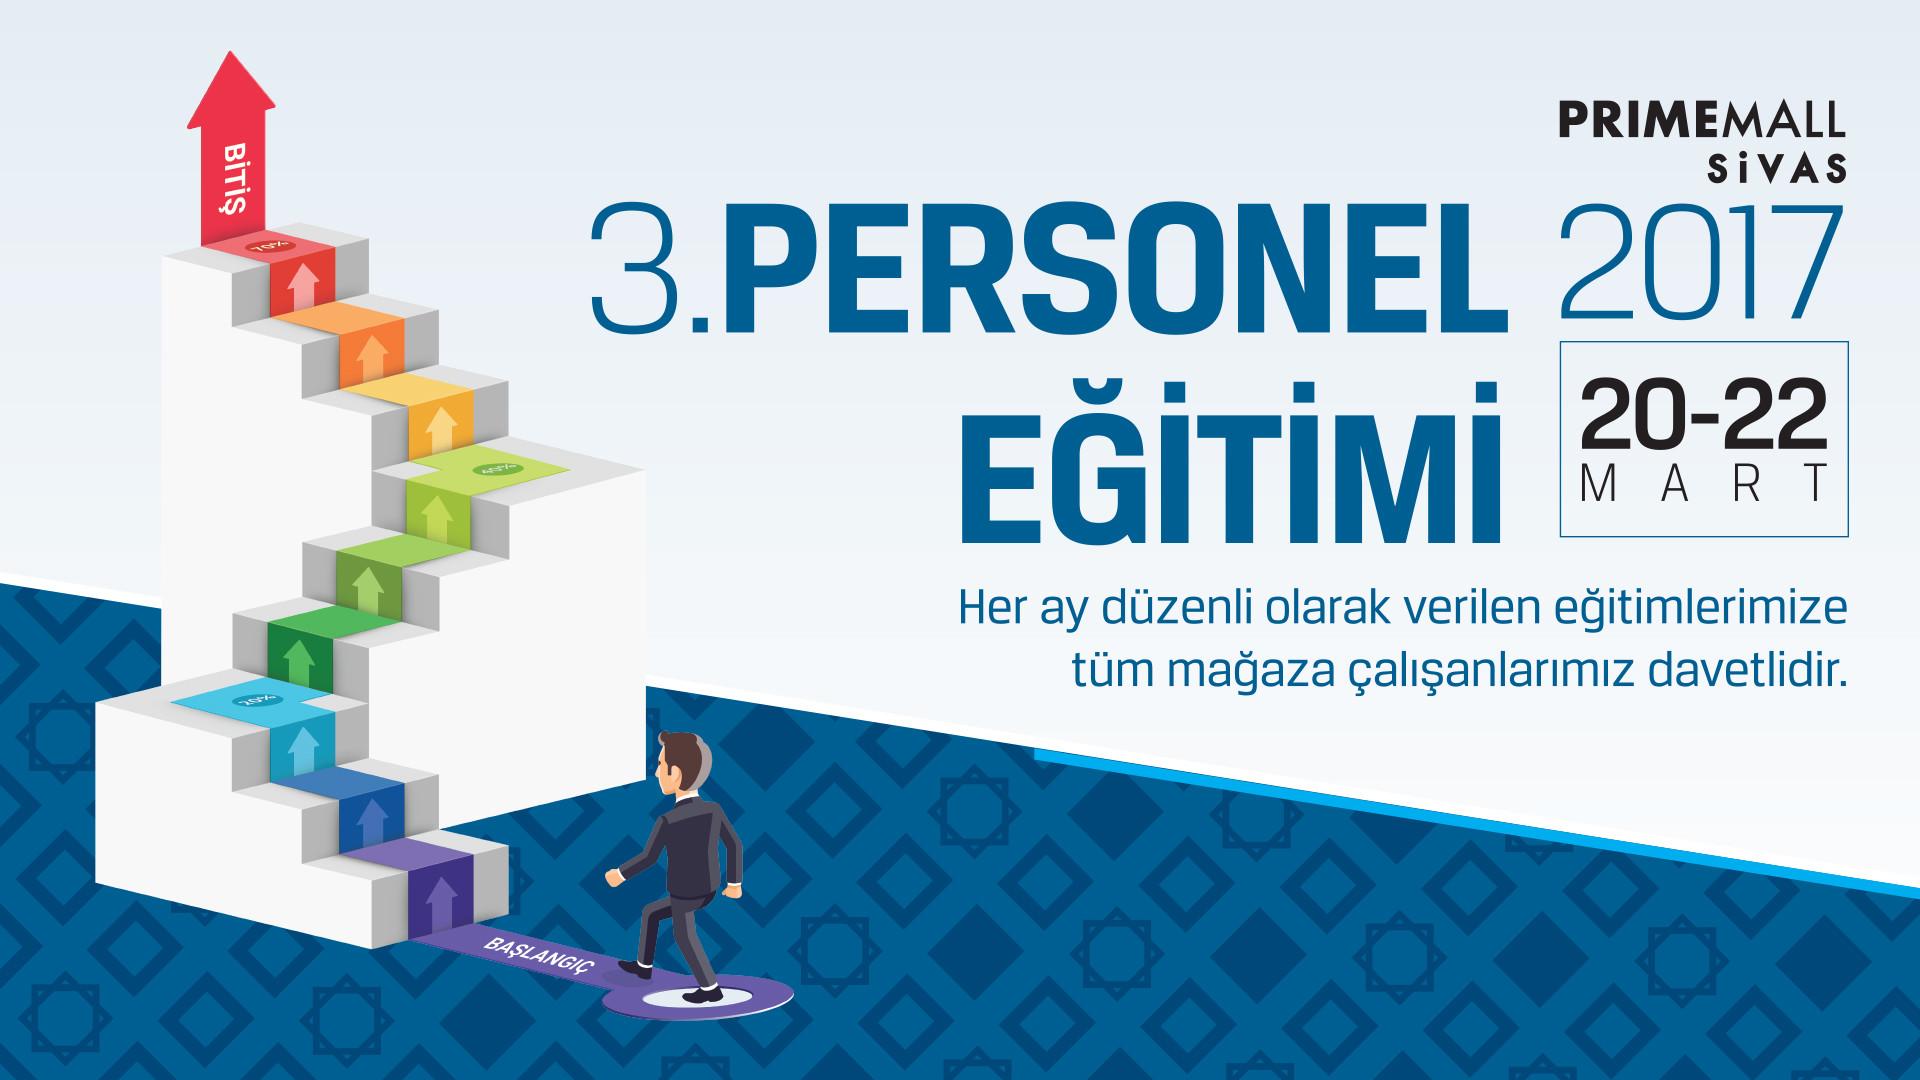 3. Personel Eğitimi